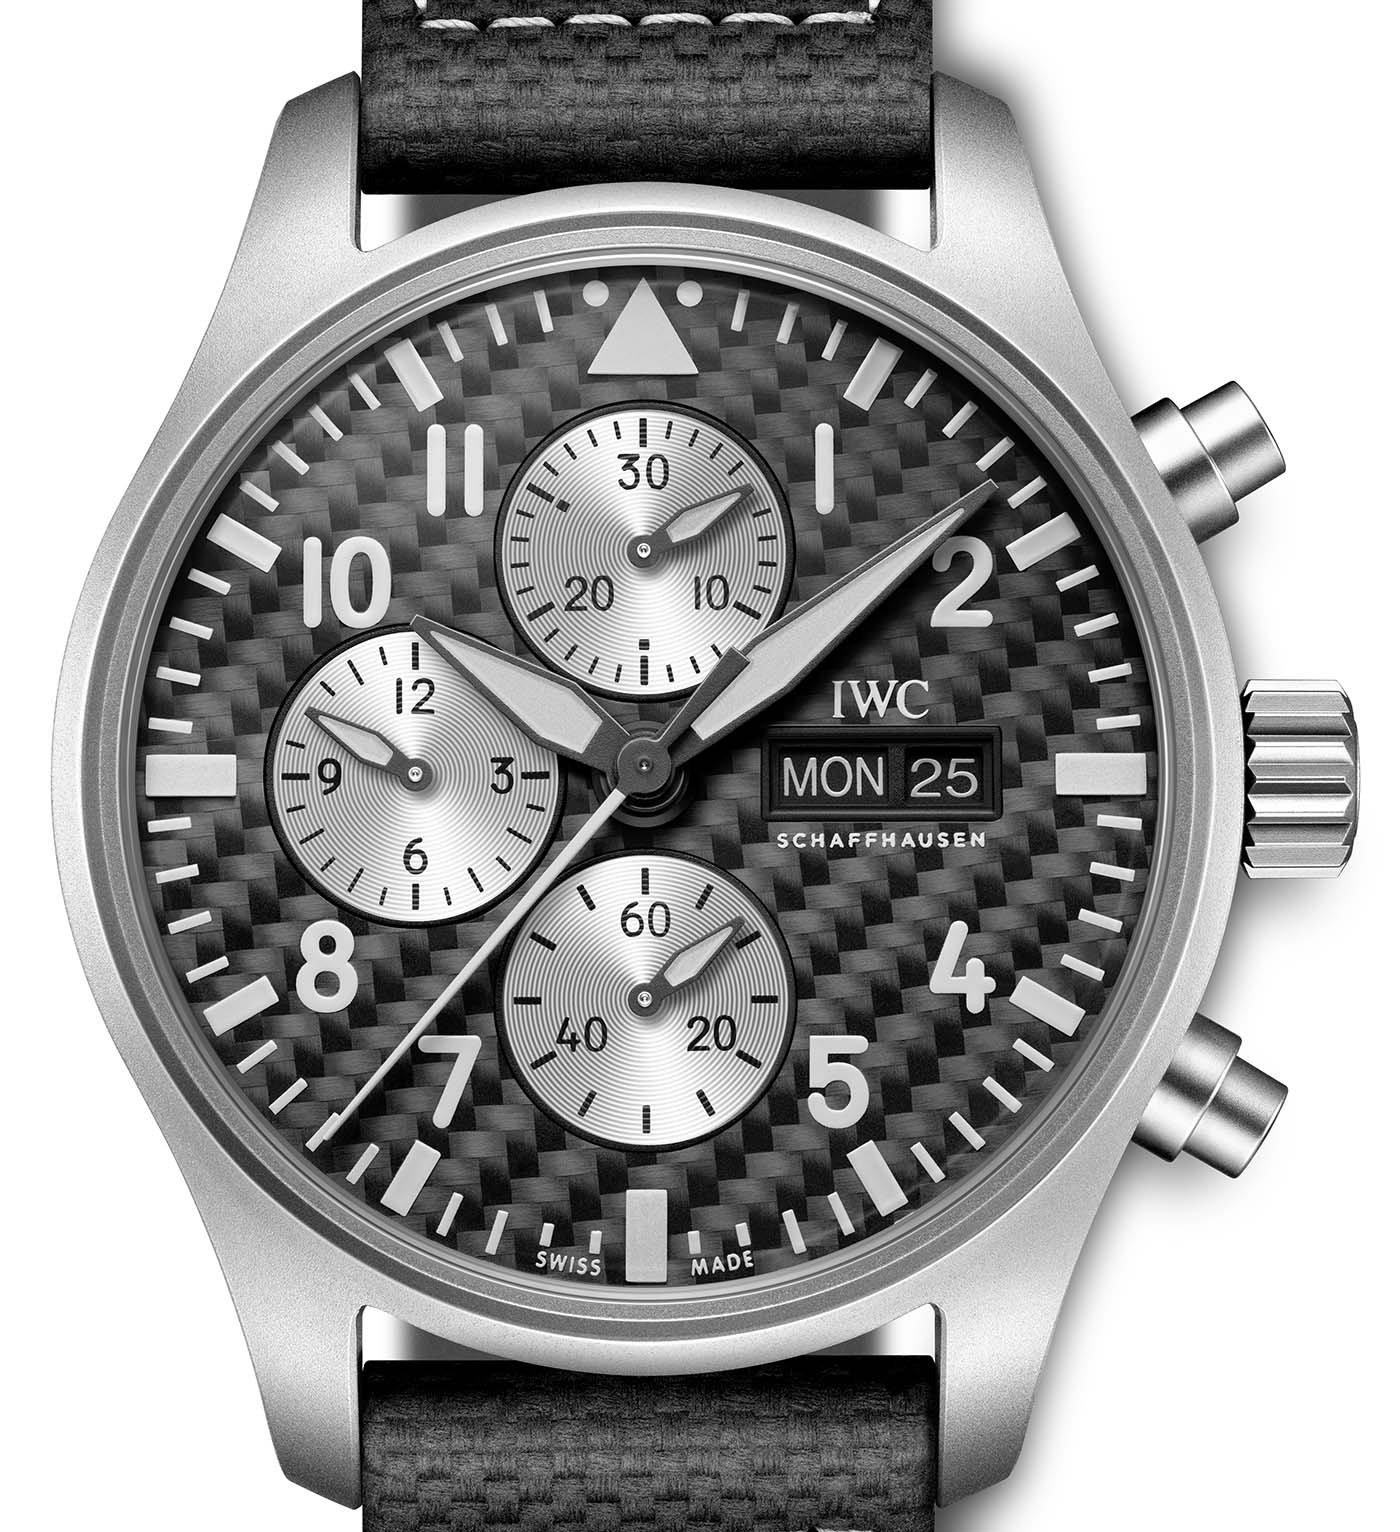 IWC представляет часы Pilot's Watch Chronograph Edition AMG